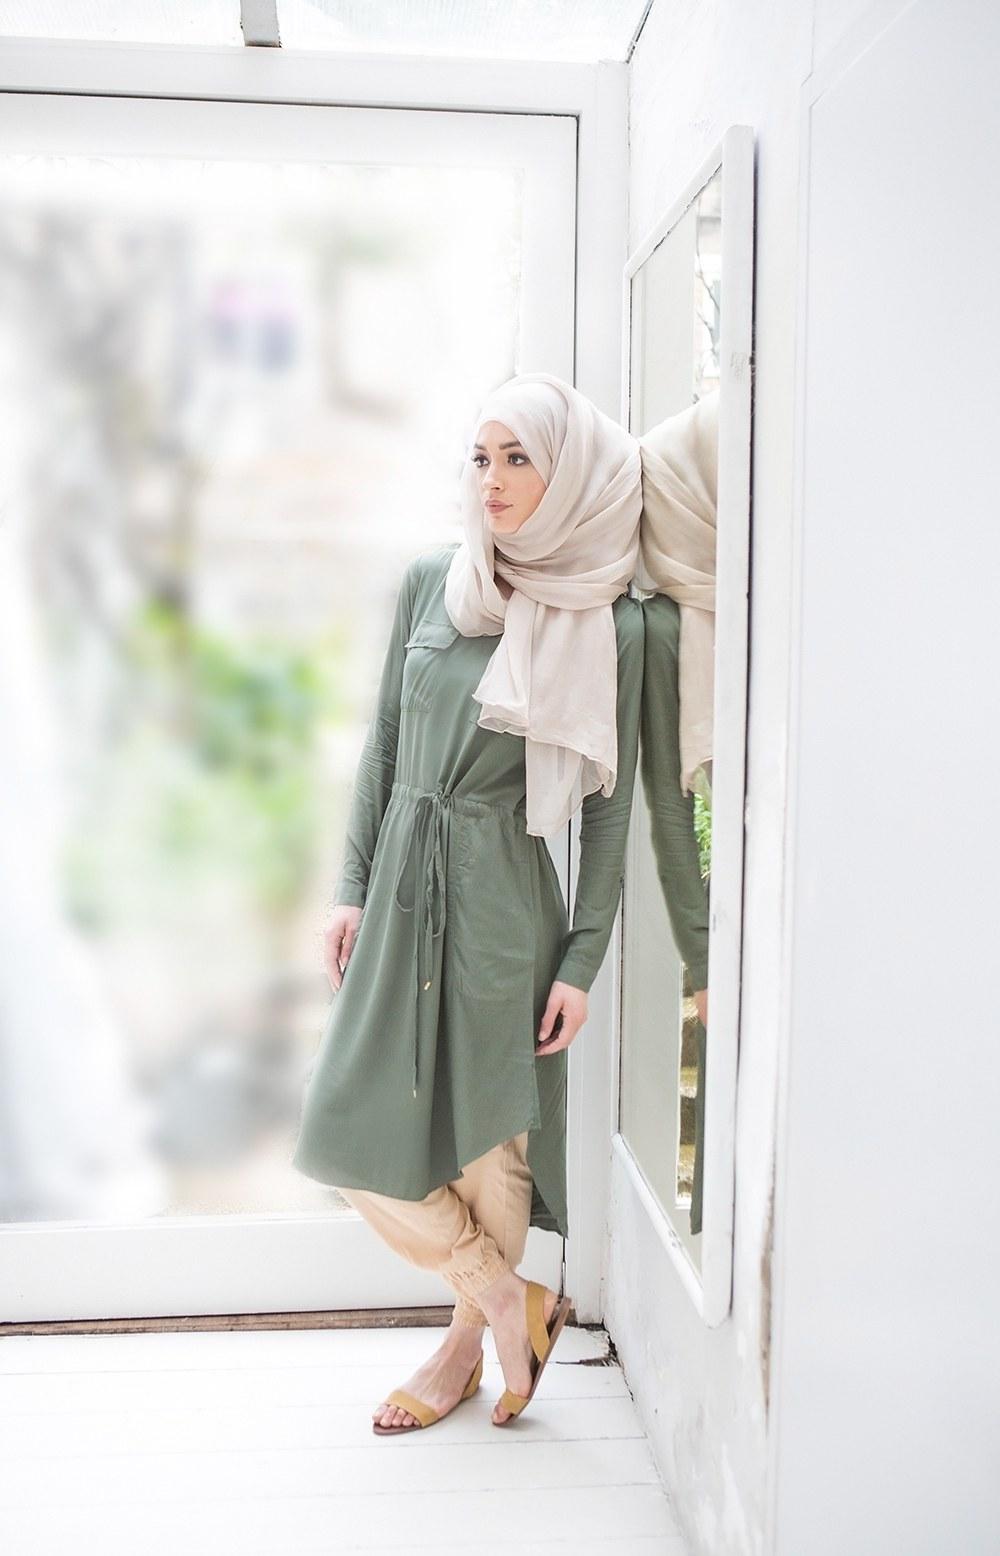 Ide Trend Baju Lebaran 2017 Zwdg 25 Trend Model Baju Muslim Lebaran 2018 Simple & Modis